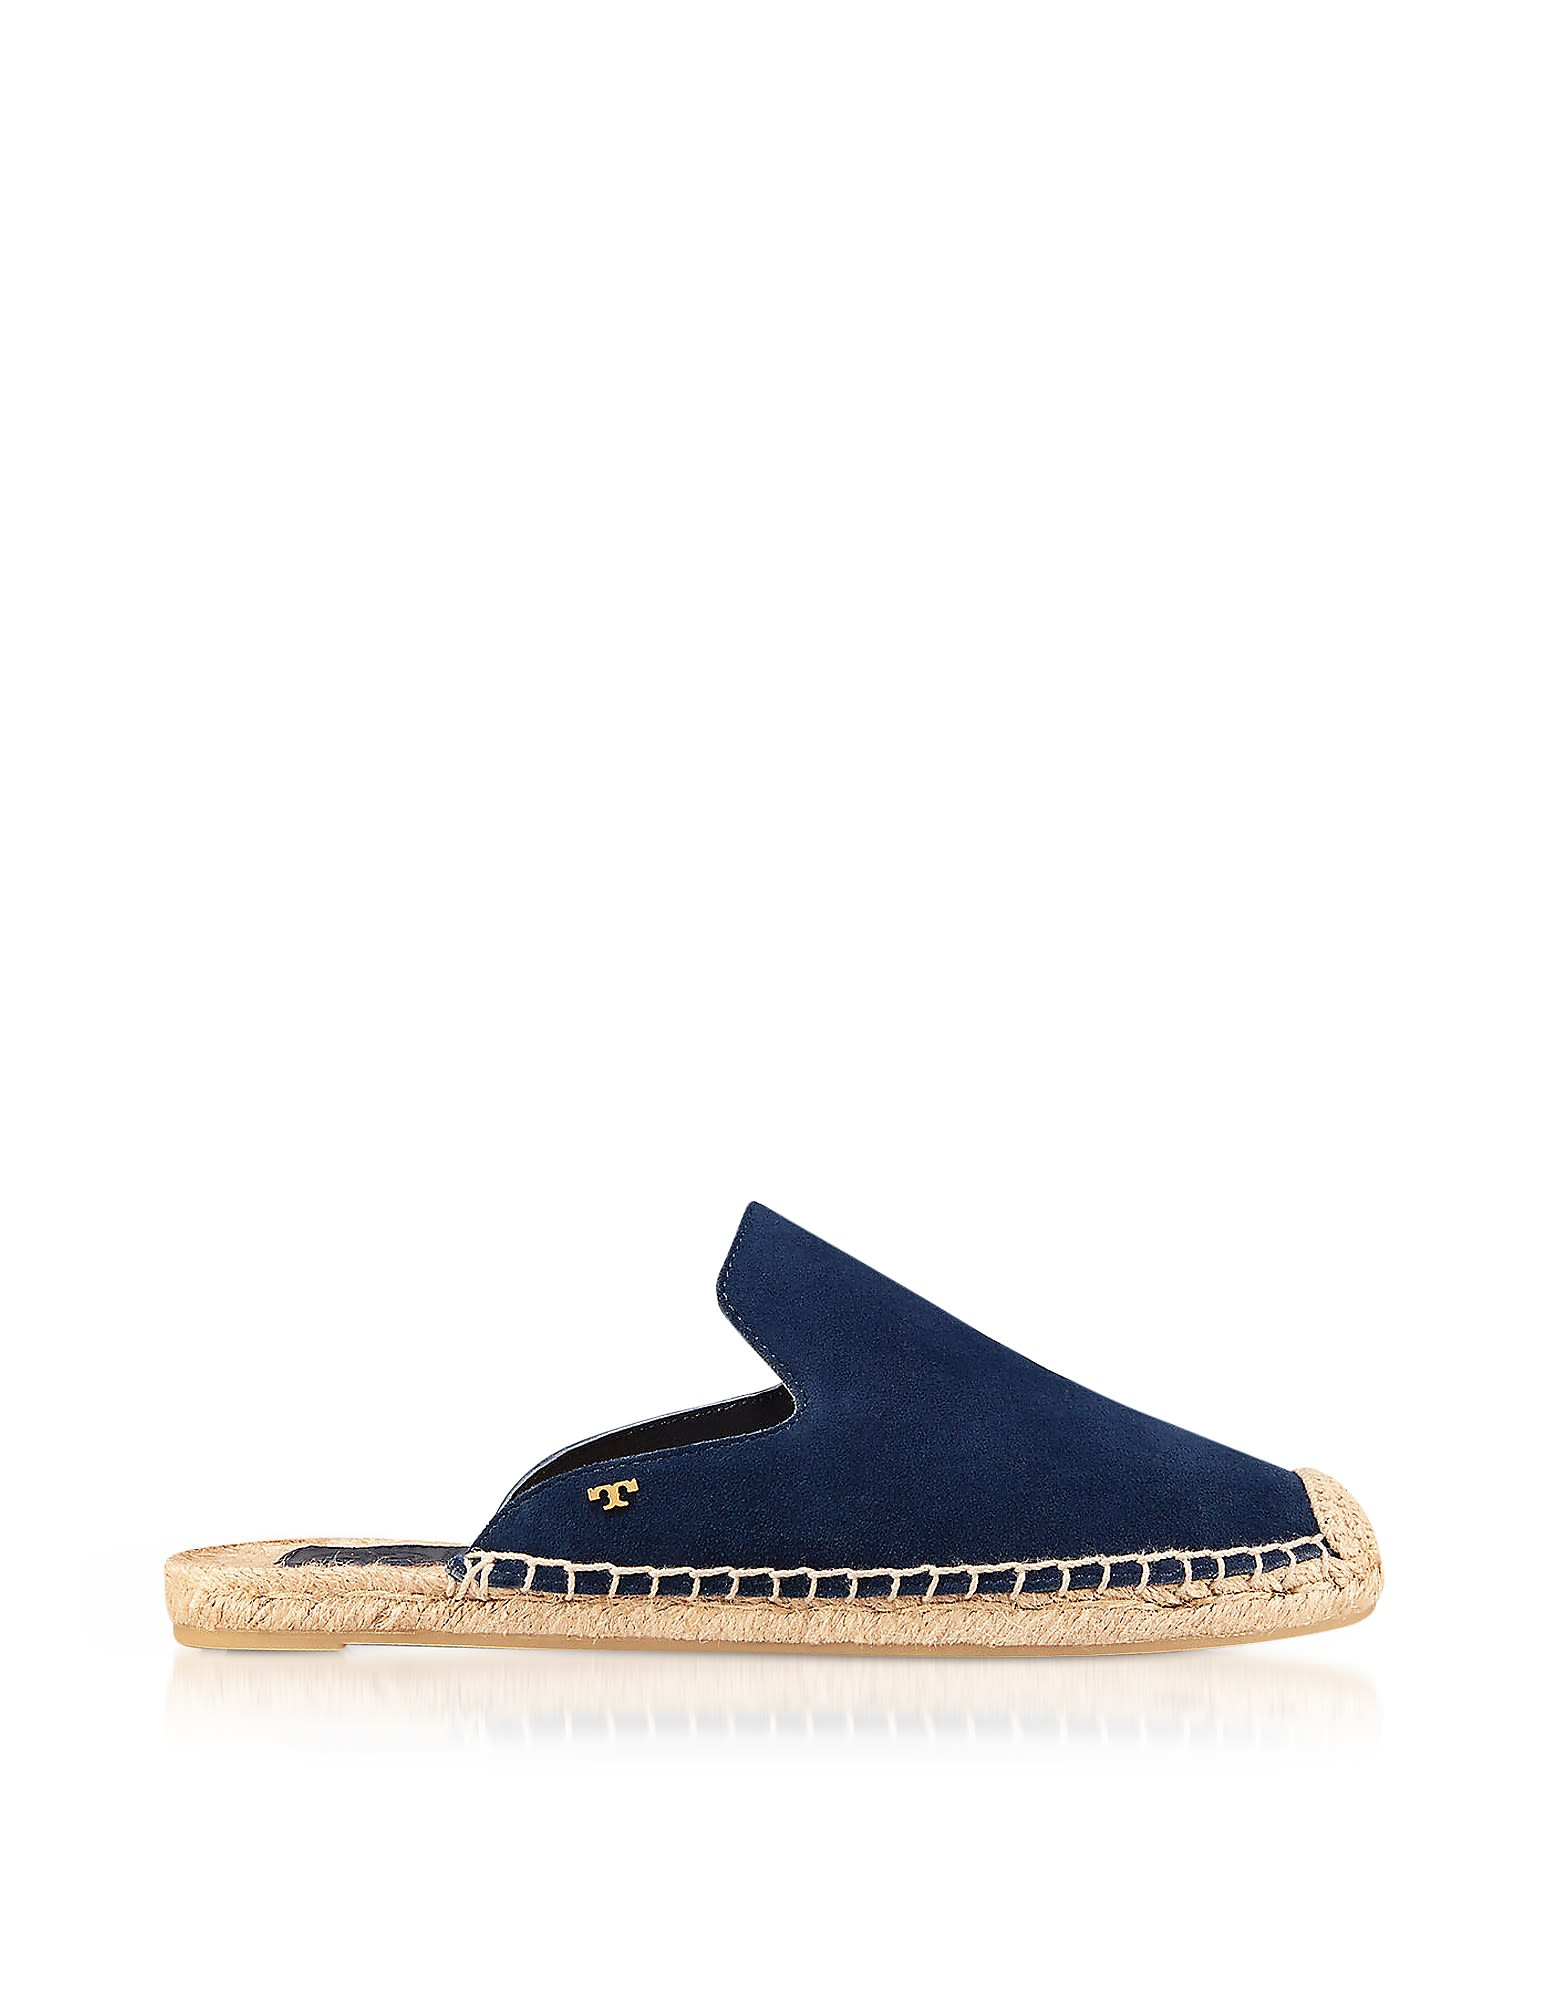 Tory Burch Designer Shoes, Max Royal Navy Suede Flat Slide Espadrilles